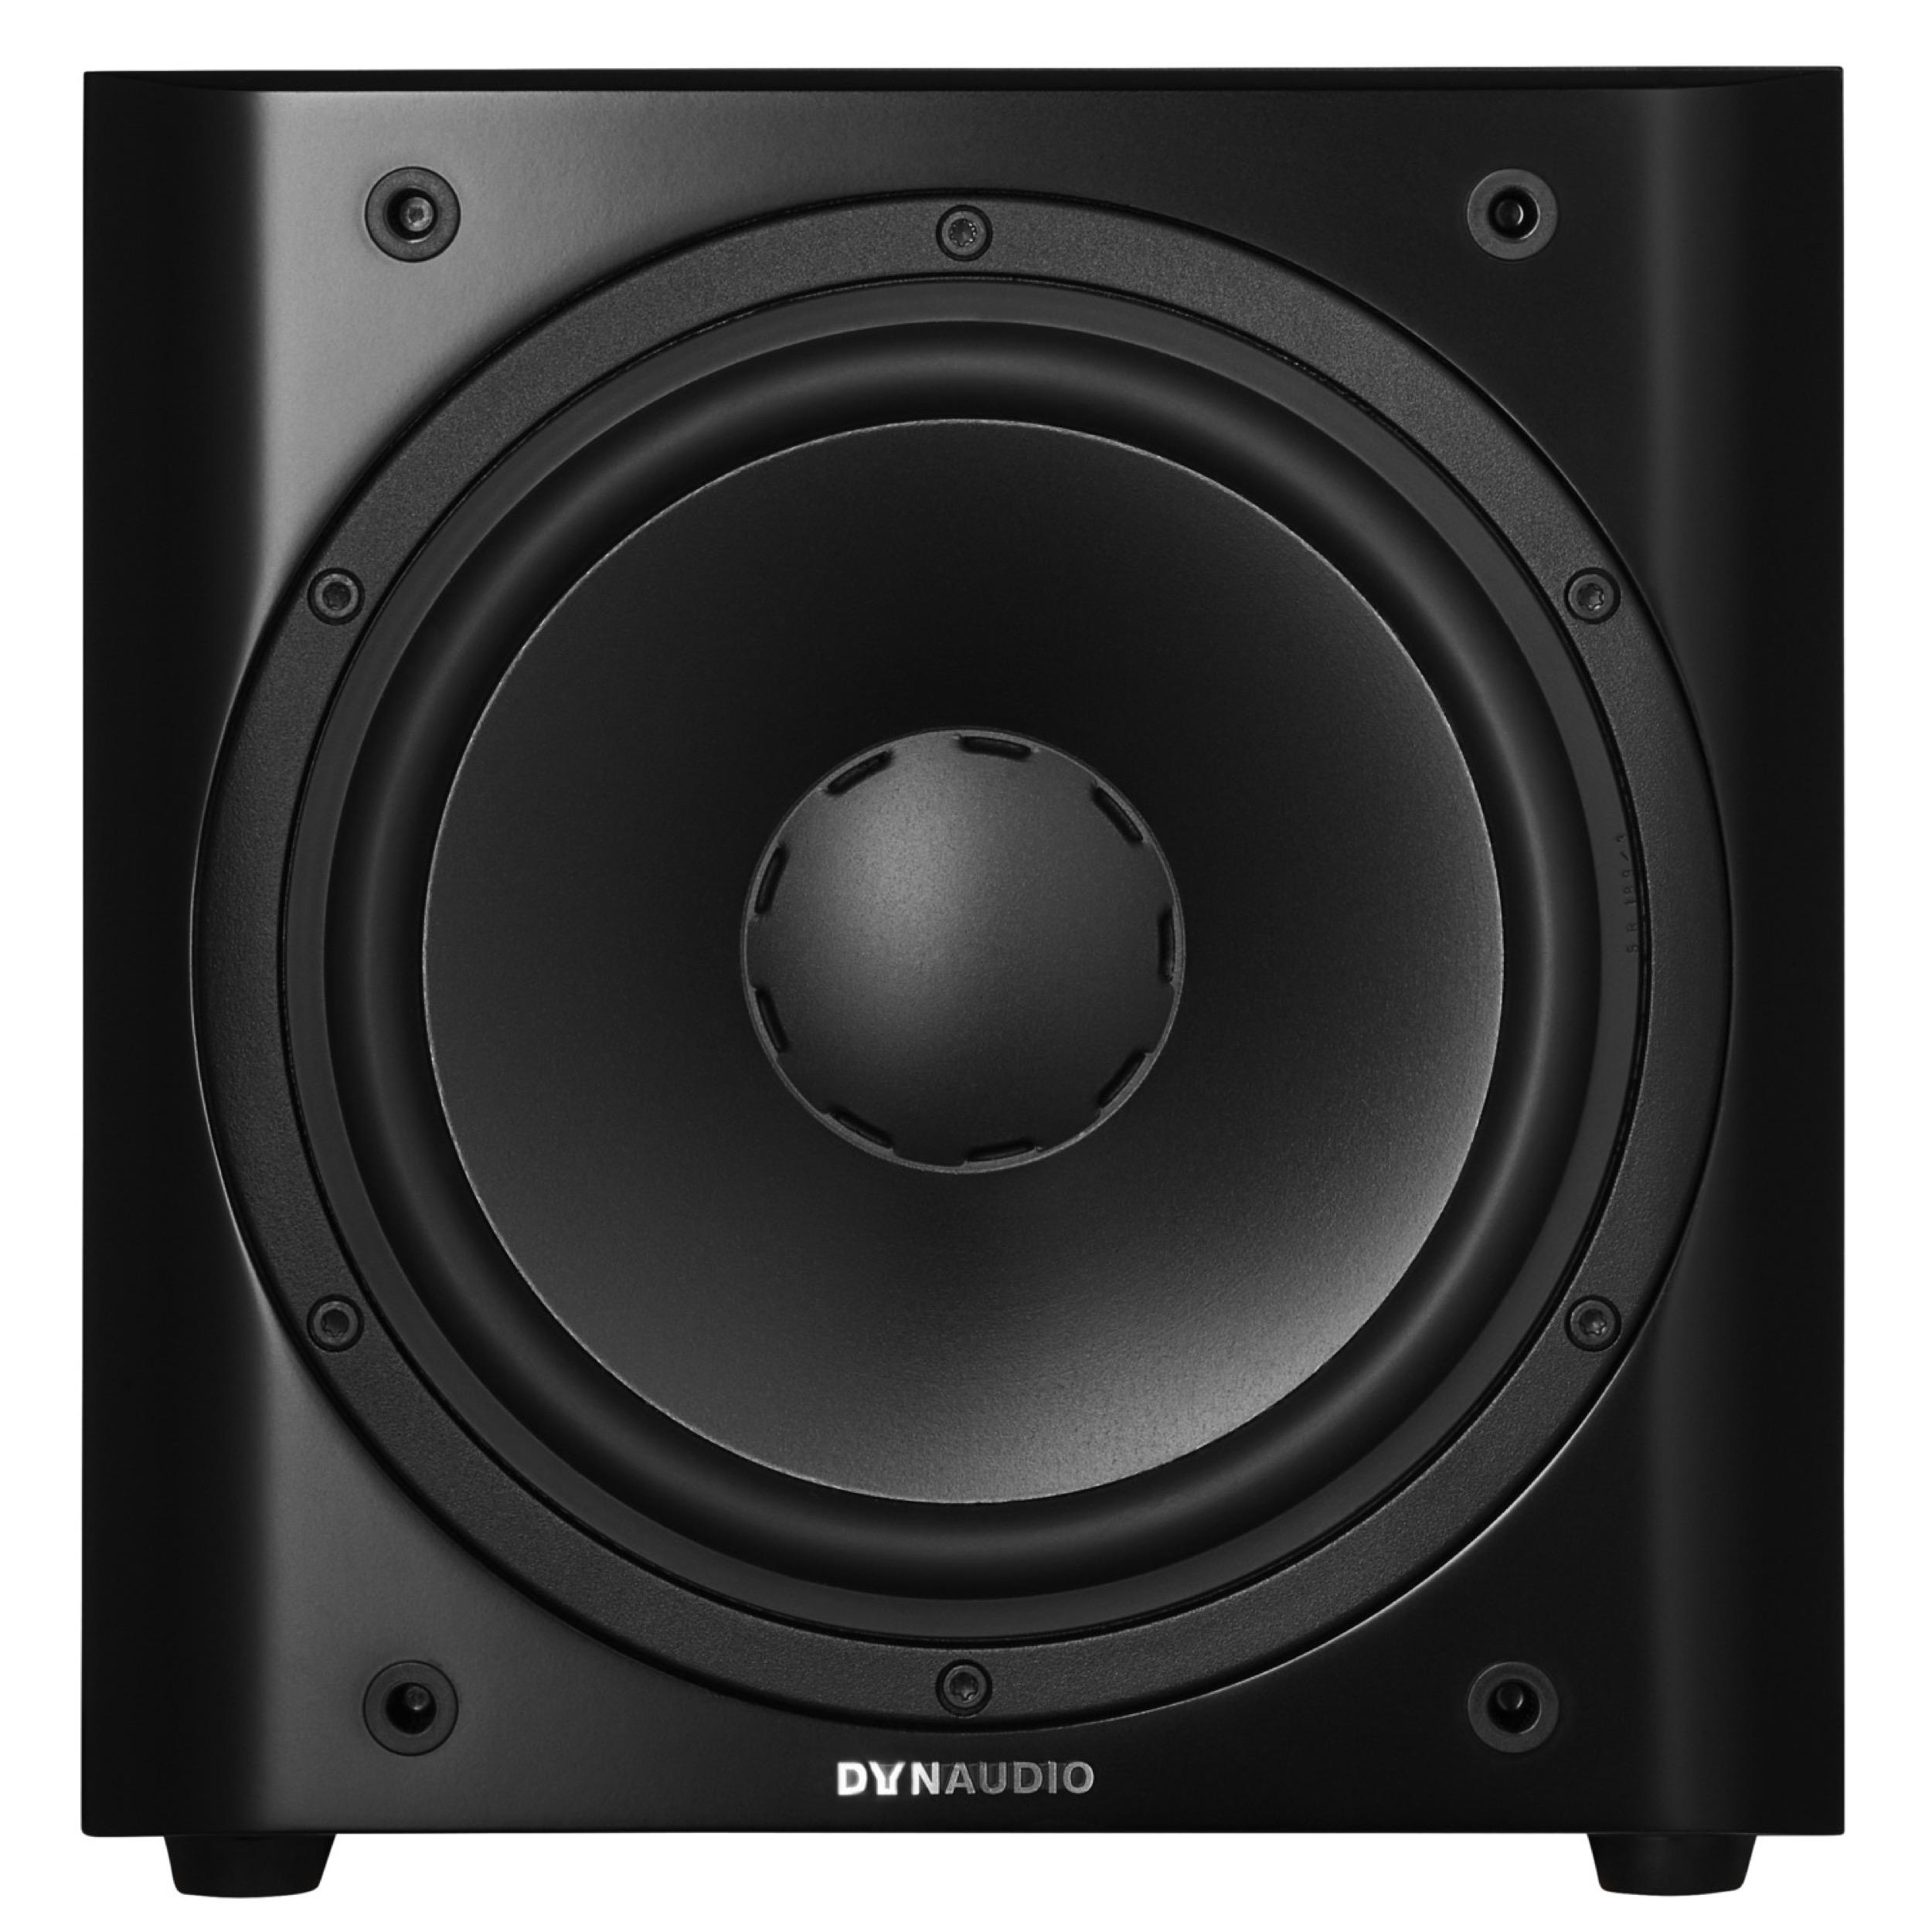 dynaudio sub 3 wide screen audio. Black Bedroom Furniture Sets. Home Design Ideas